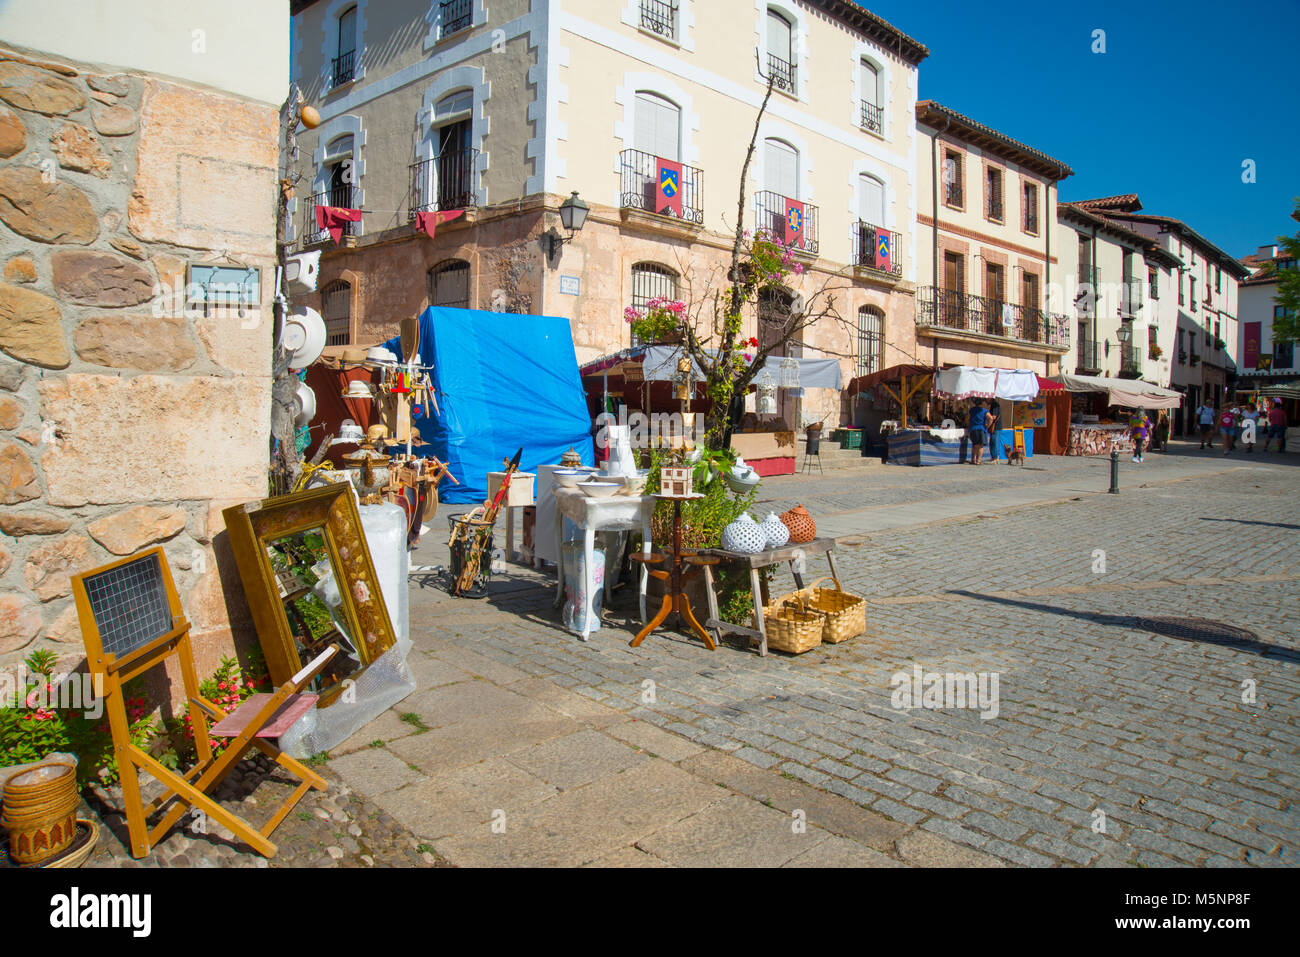 Antique flea market. Covarrubias, Burgos province, Spain. - Stock Image